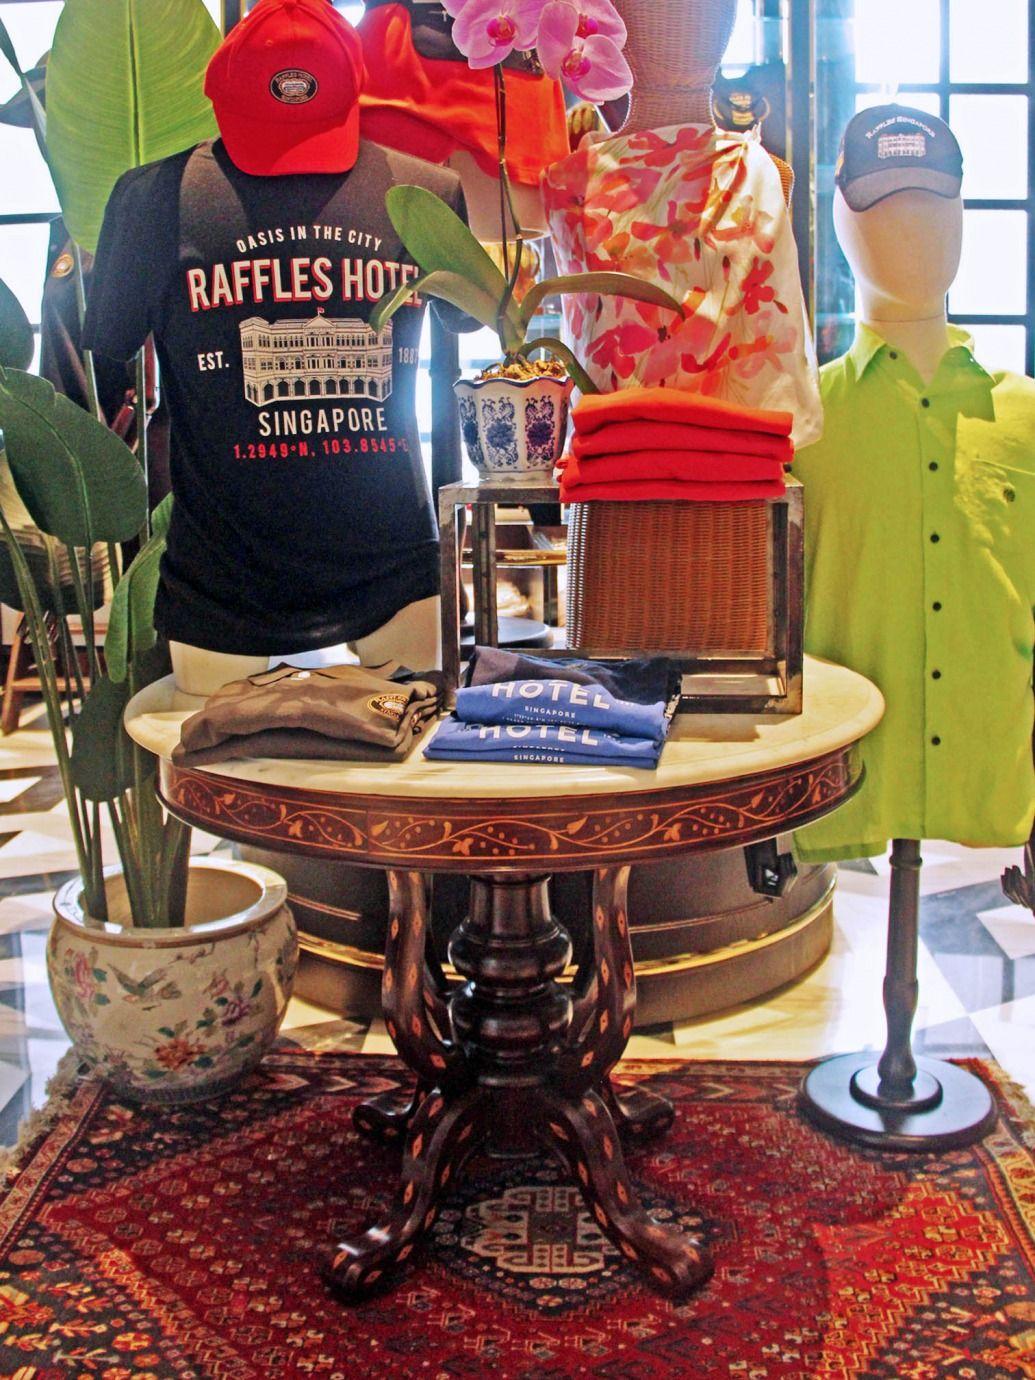 Proud Associate of Raffles Hotel - Raffles Boutique l The Past Perfect Collection l Singapore